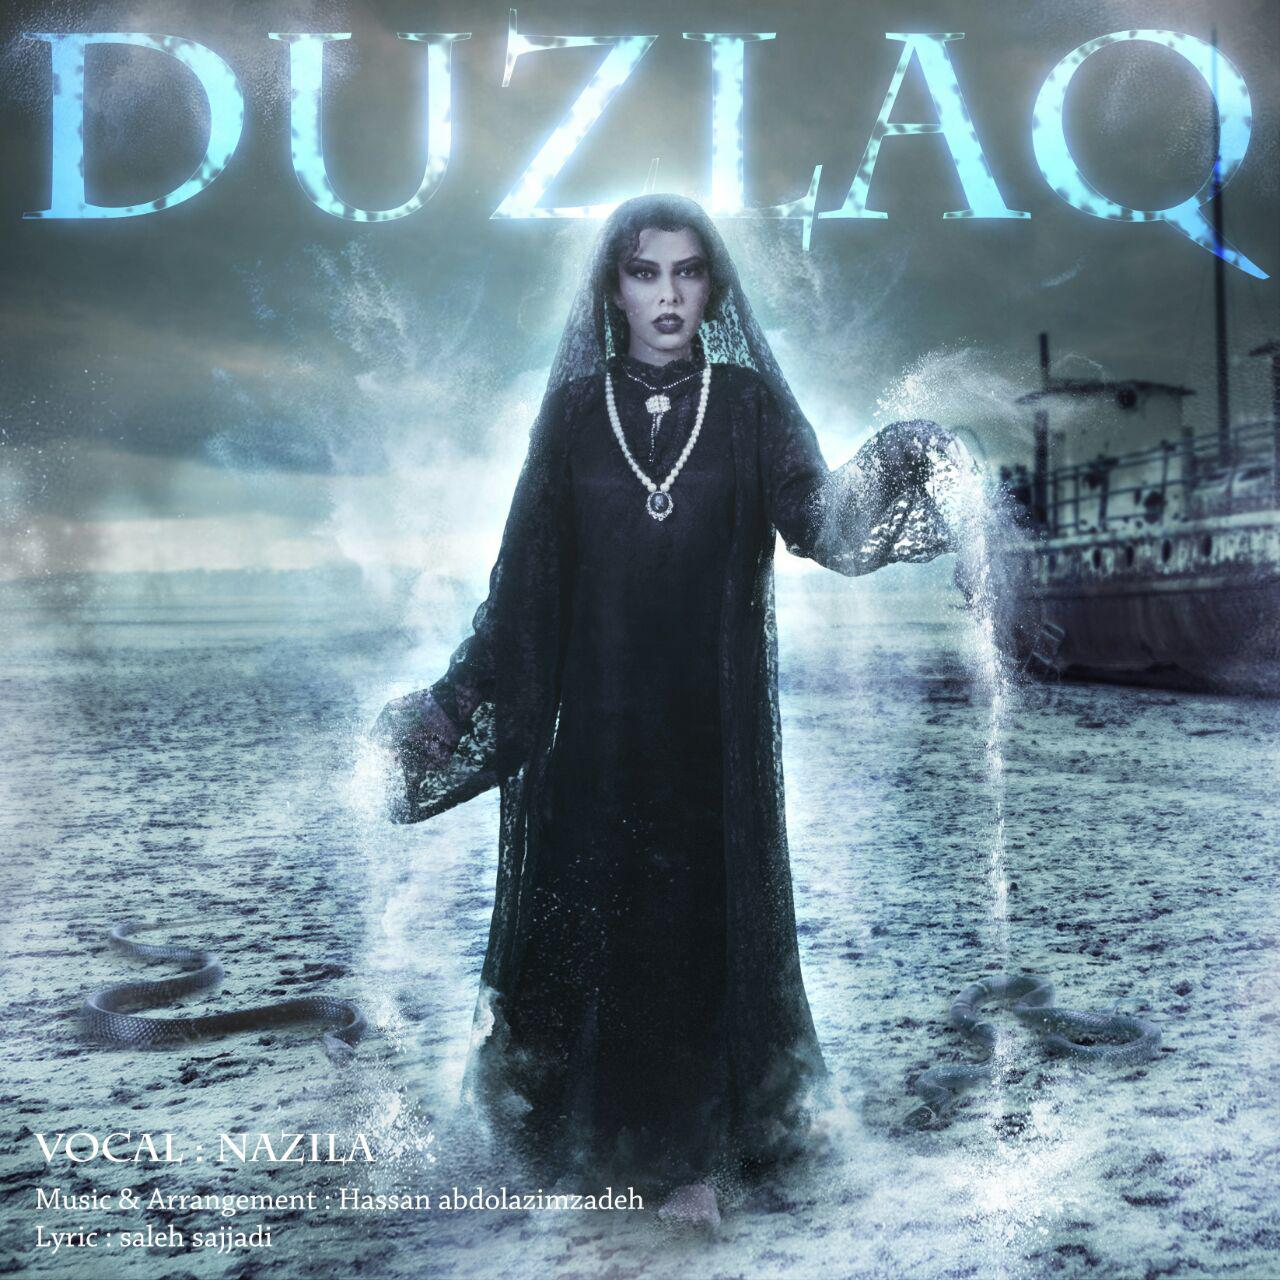 http://s8.picofile.com/file/8329877700/43Nazila_Babapur_Duzlaq.jpg